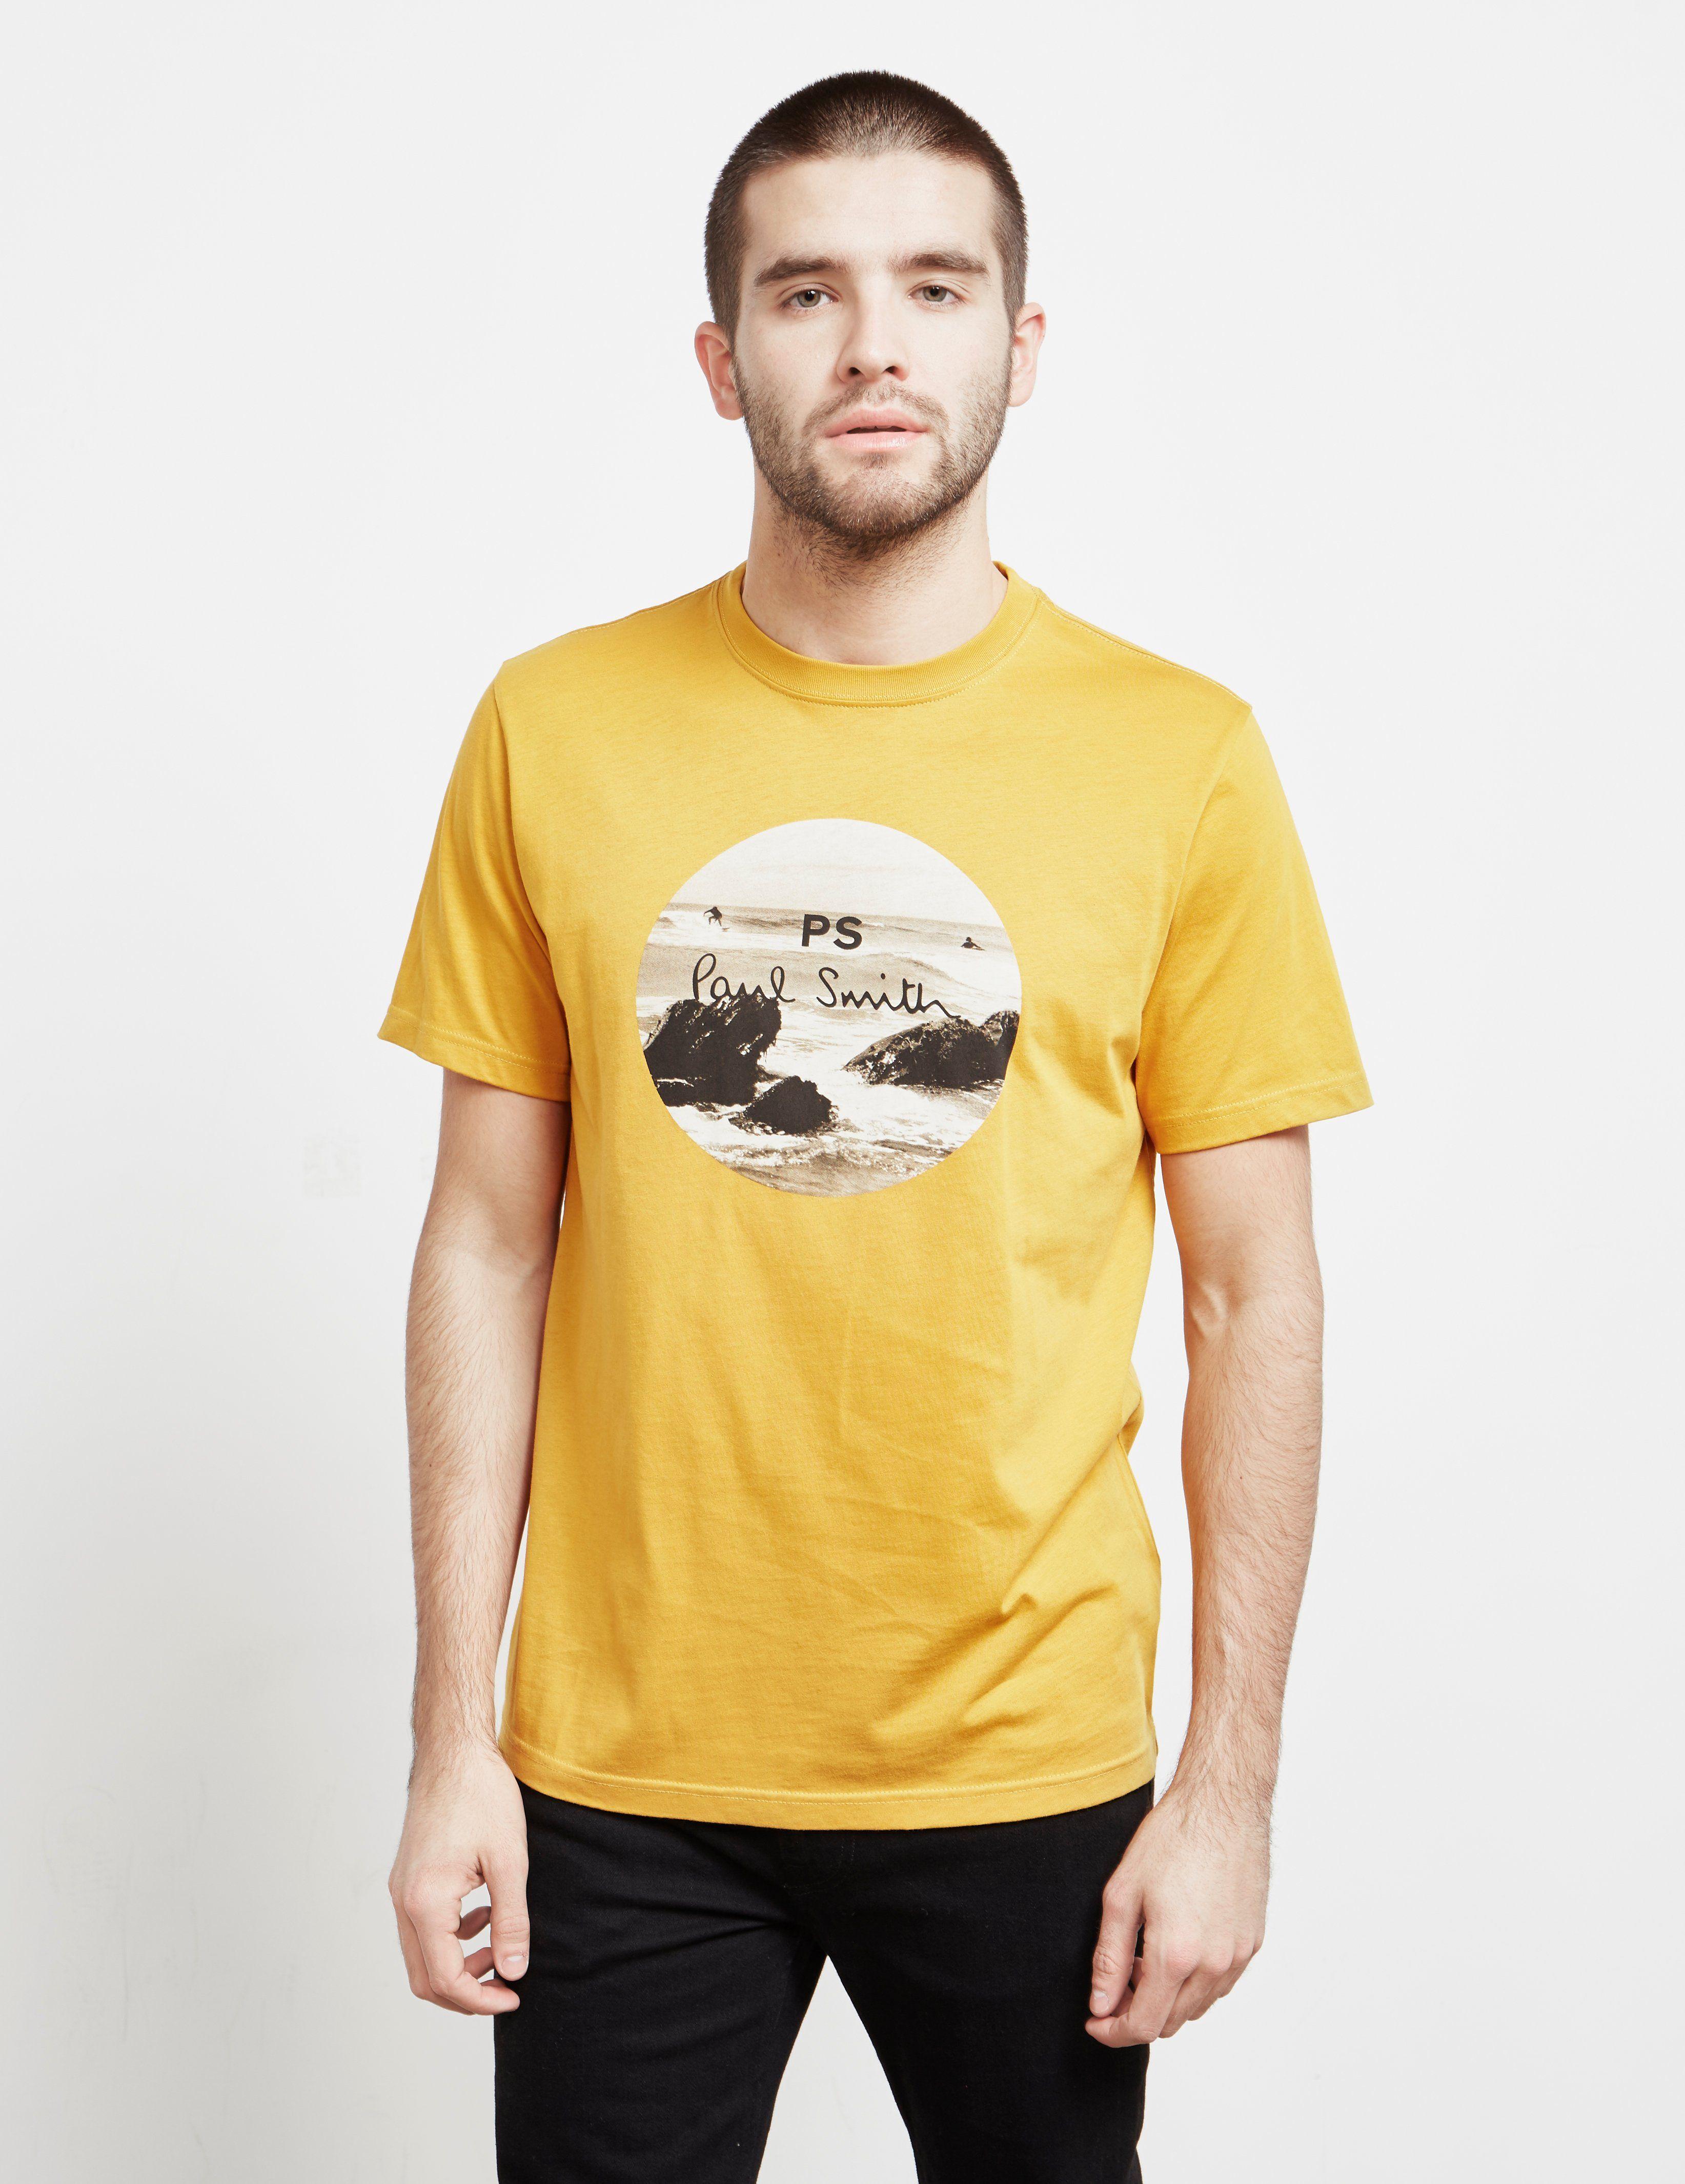 PS Paul Smith Rocks Short Sleeve T-Shirt